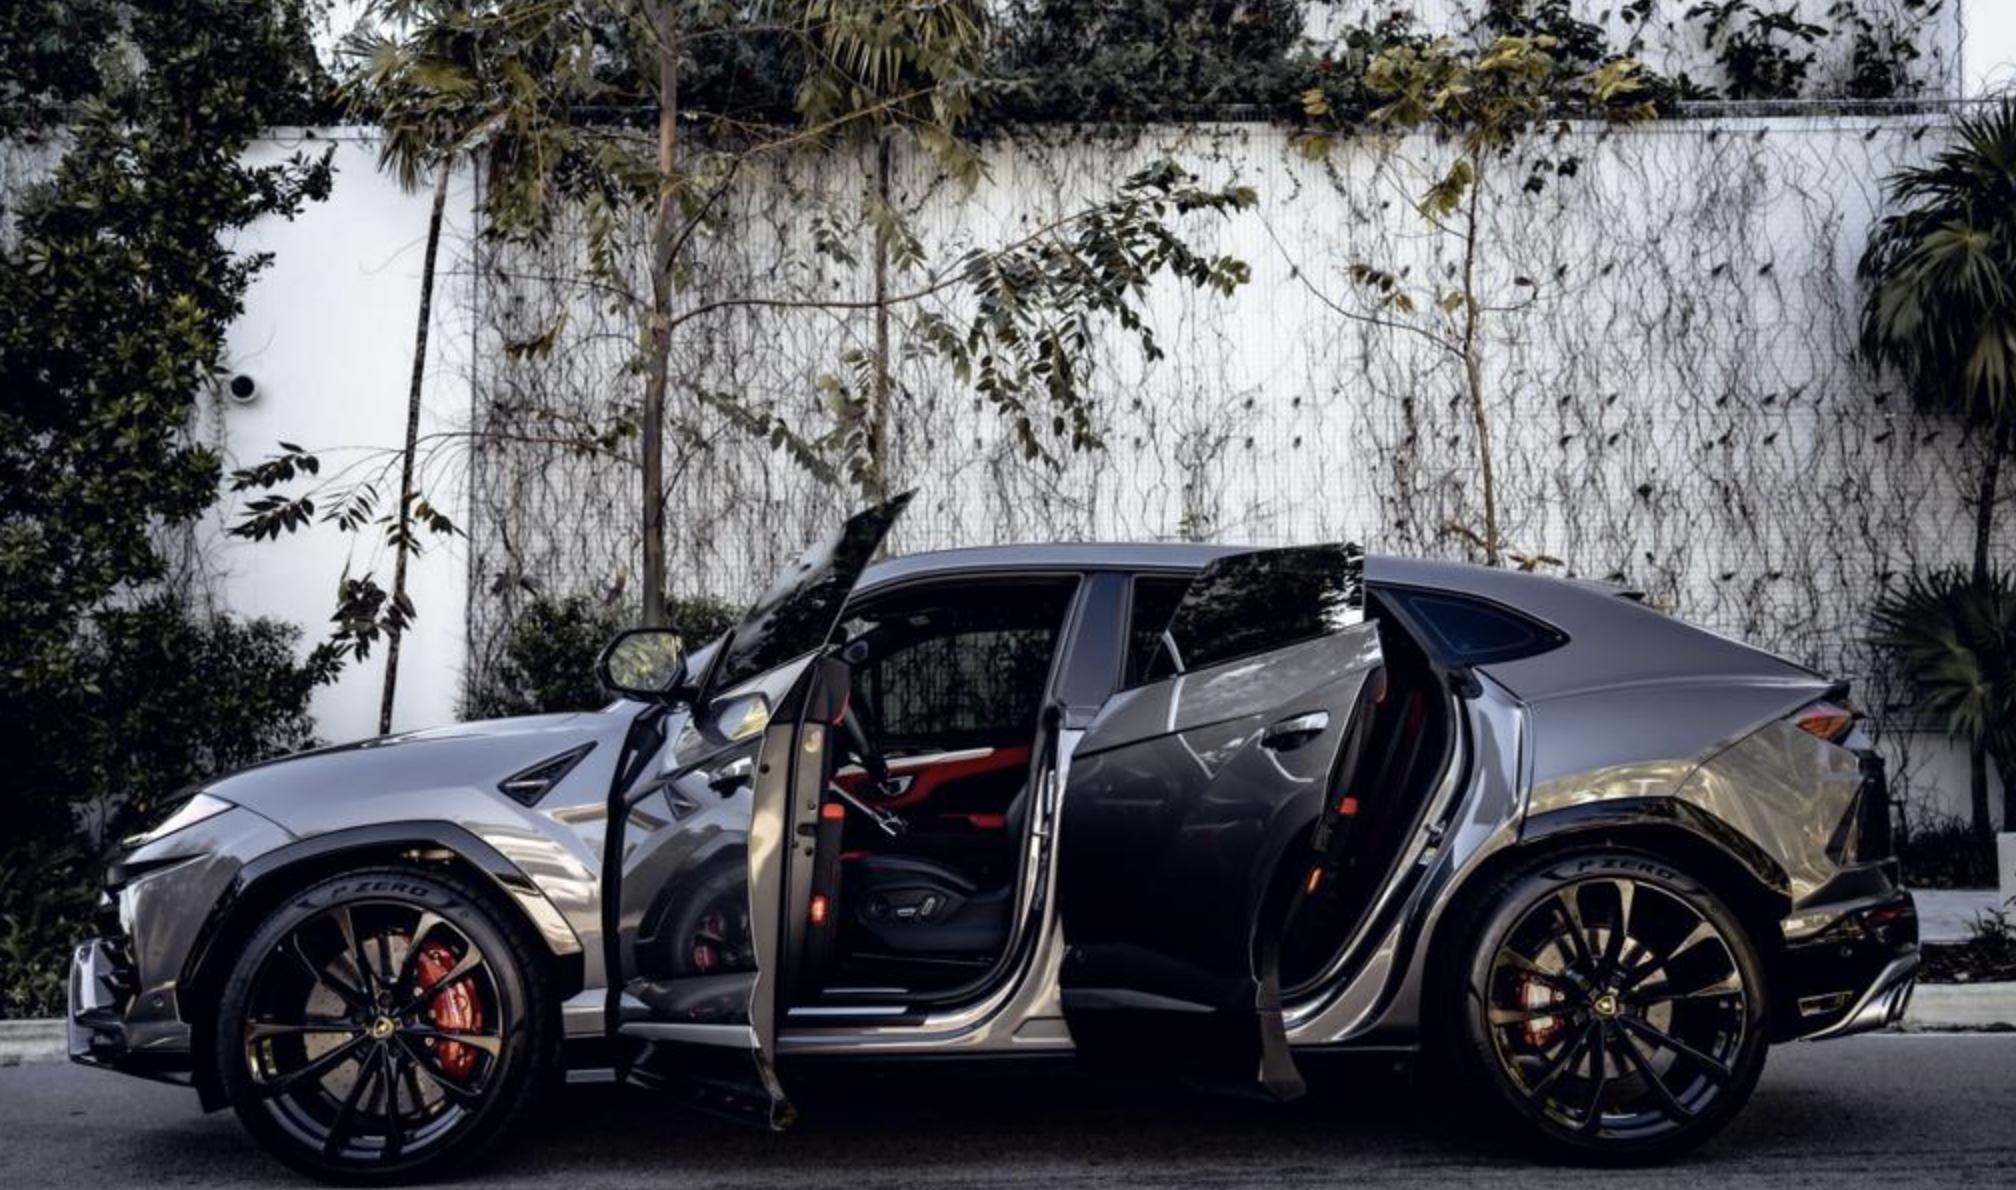 Image #0 of our  2021 Lamborghini Urus - Silver    In Miami Fort Lauderdale Palm Beach South Florida